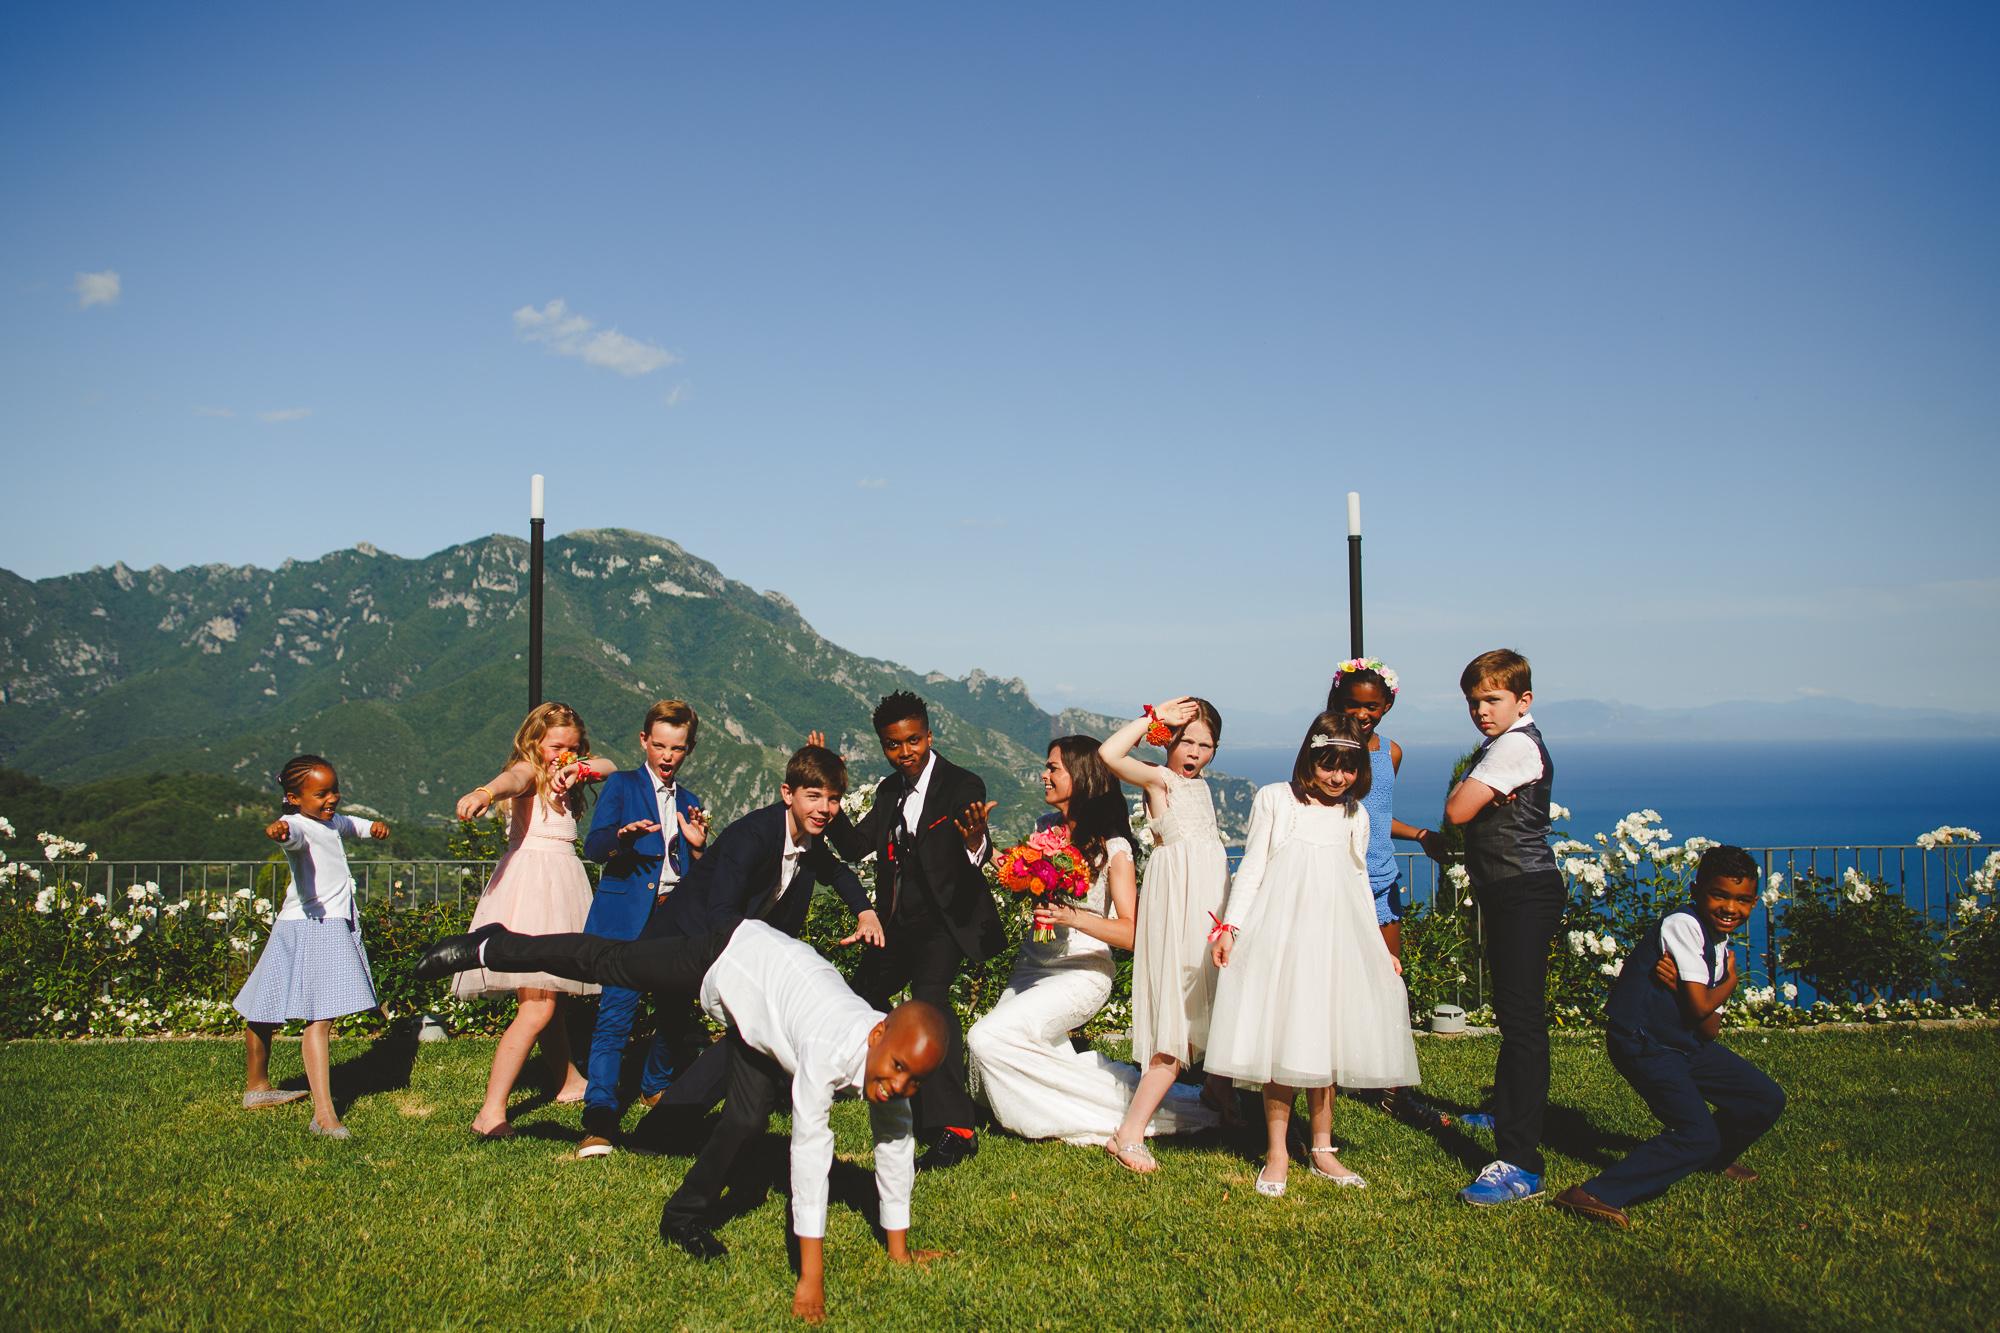 destination-wedding-photography-amalfi-coast-ravello-10.jpg